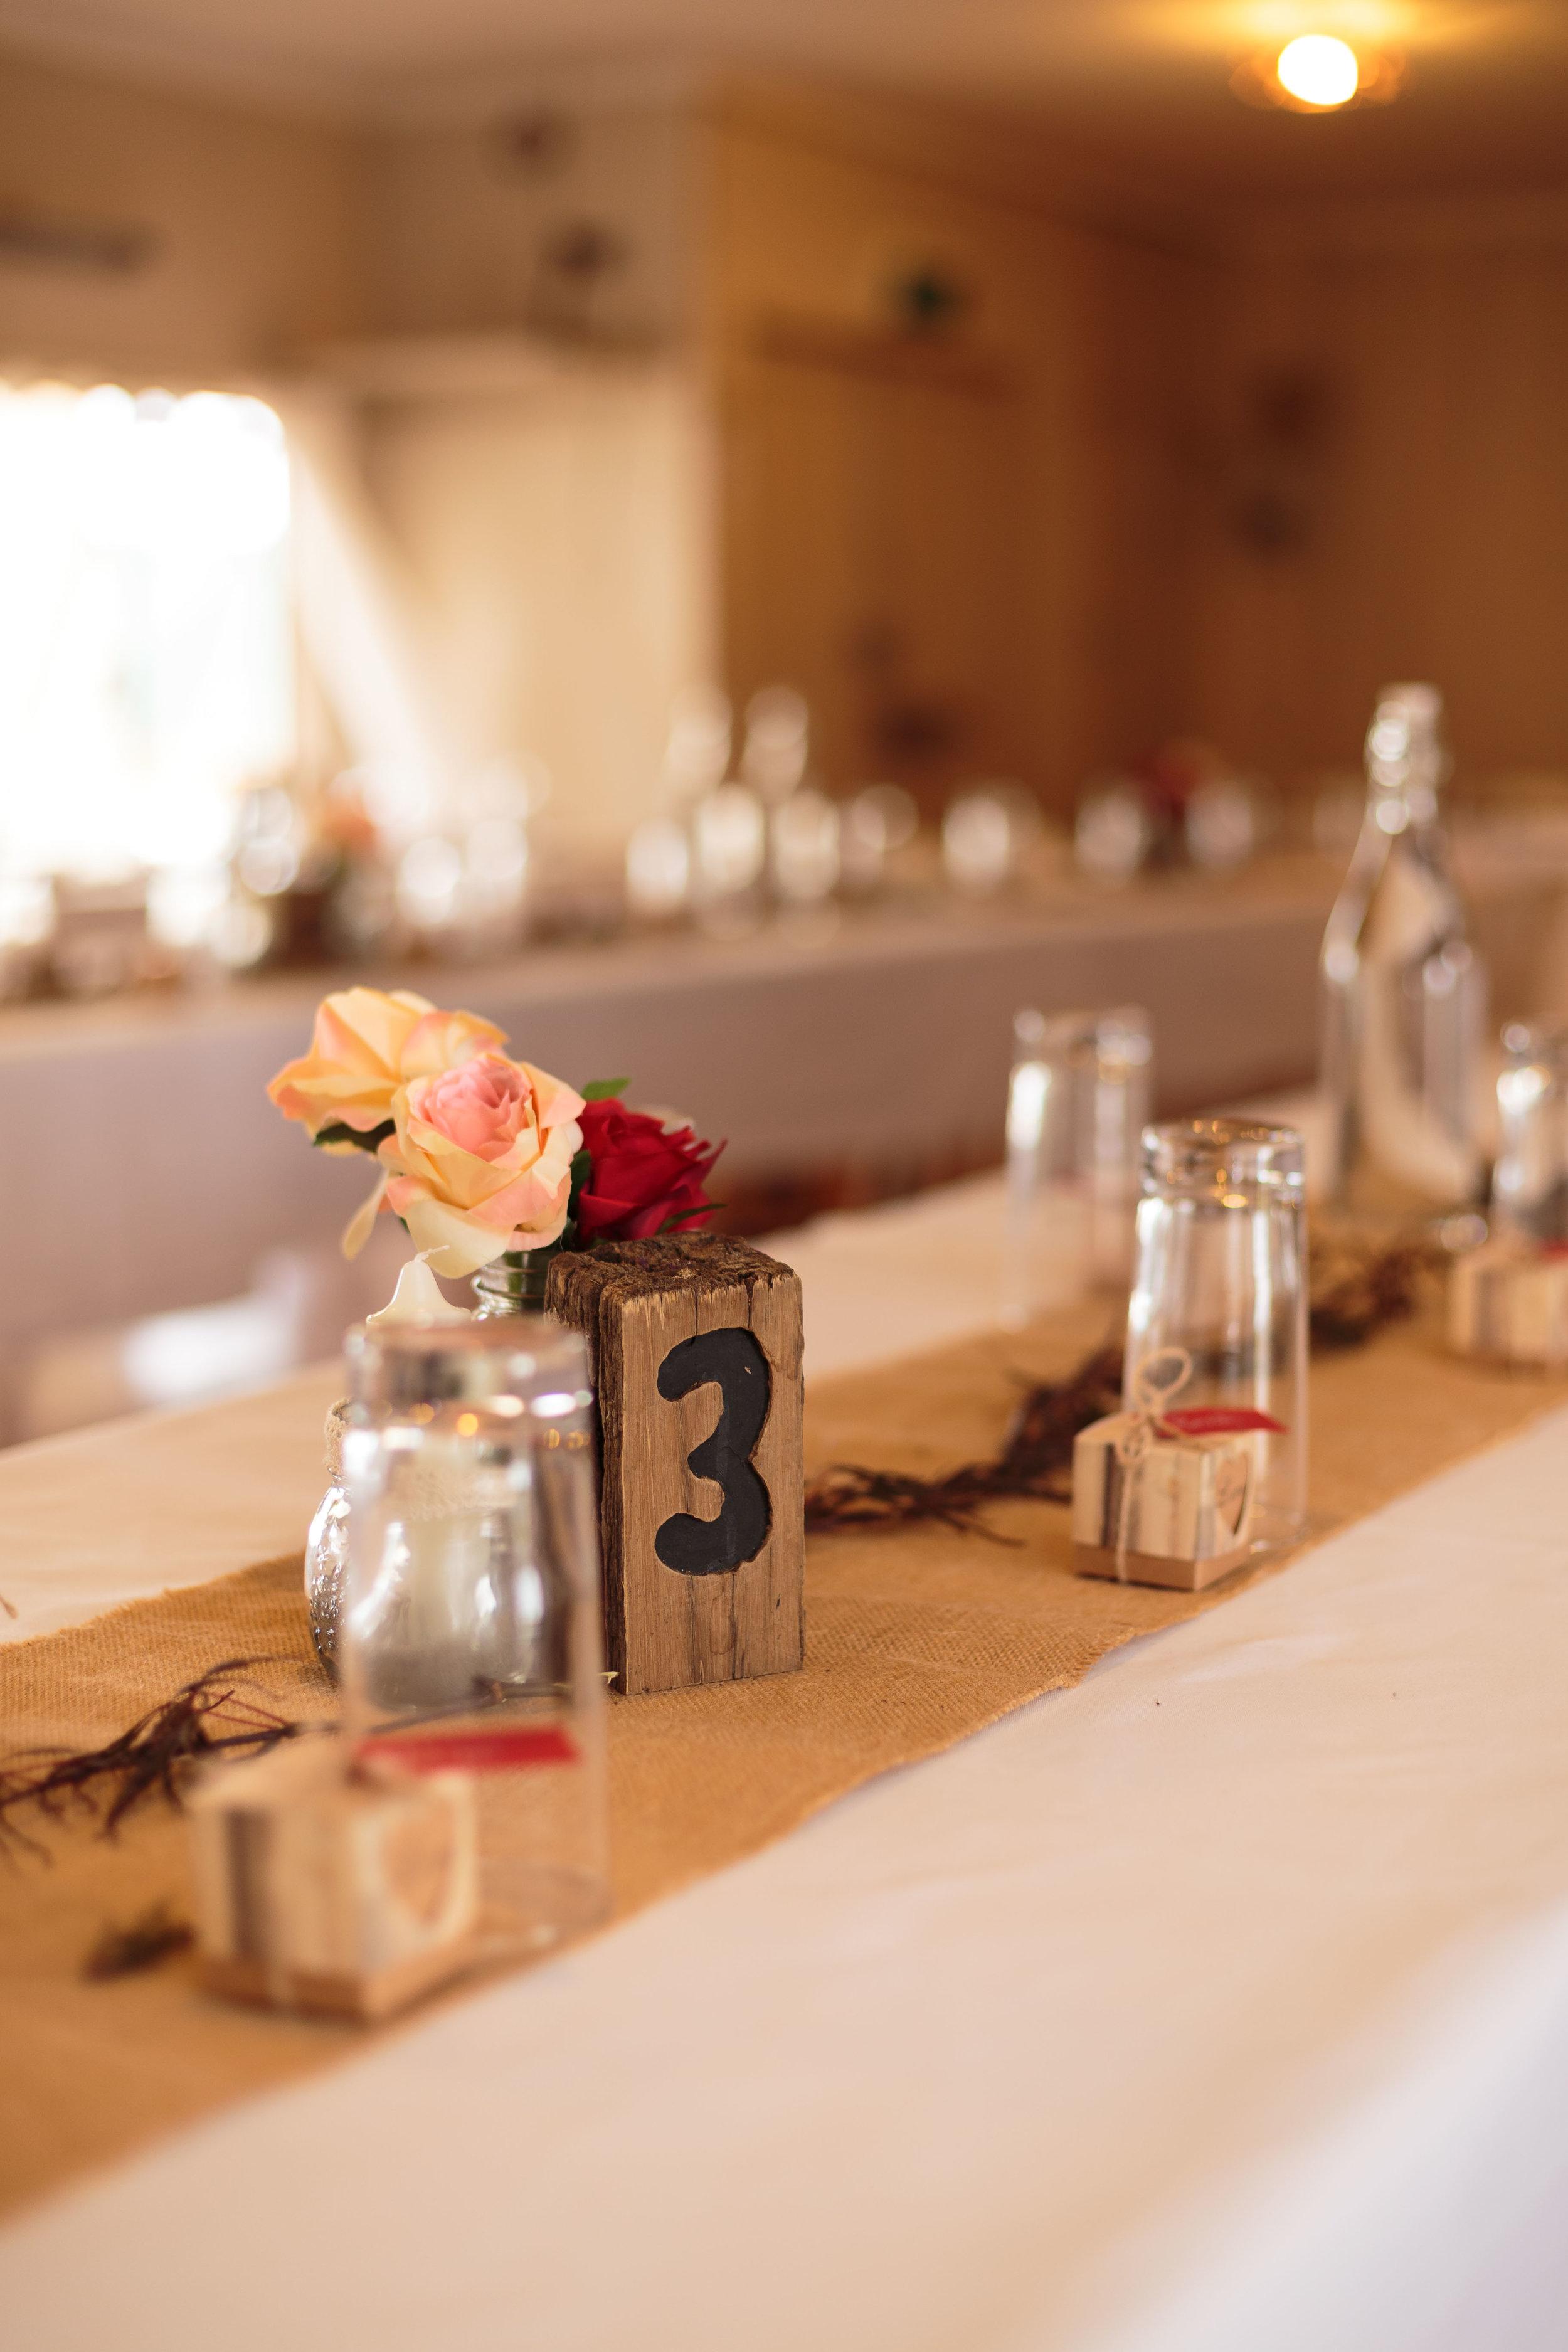 Highight-wedding-photography-dudding-lake-palmerston-north-new-zealand-11.jpg